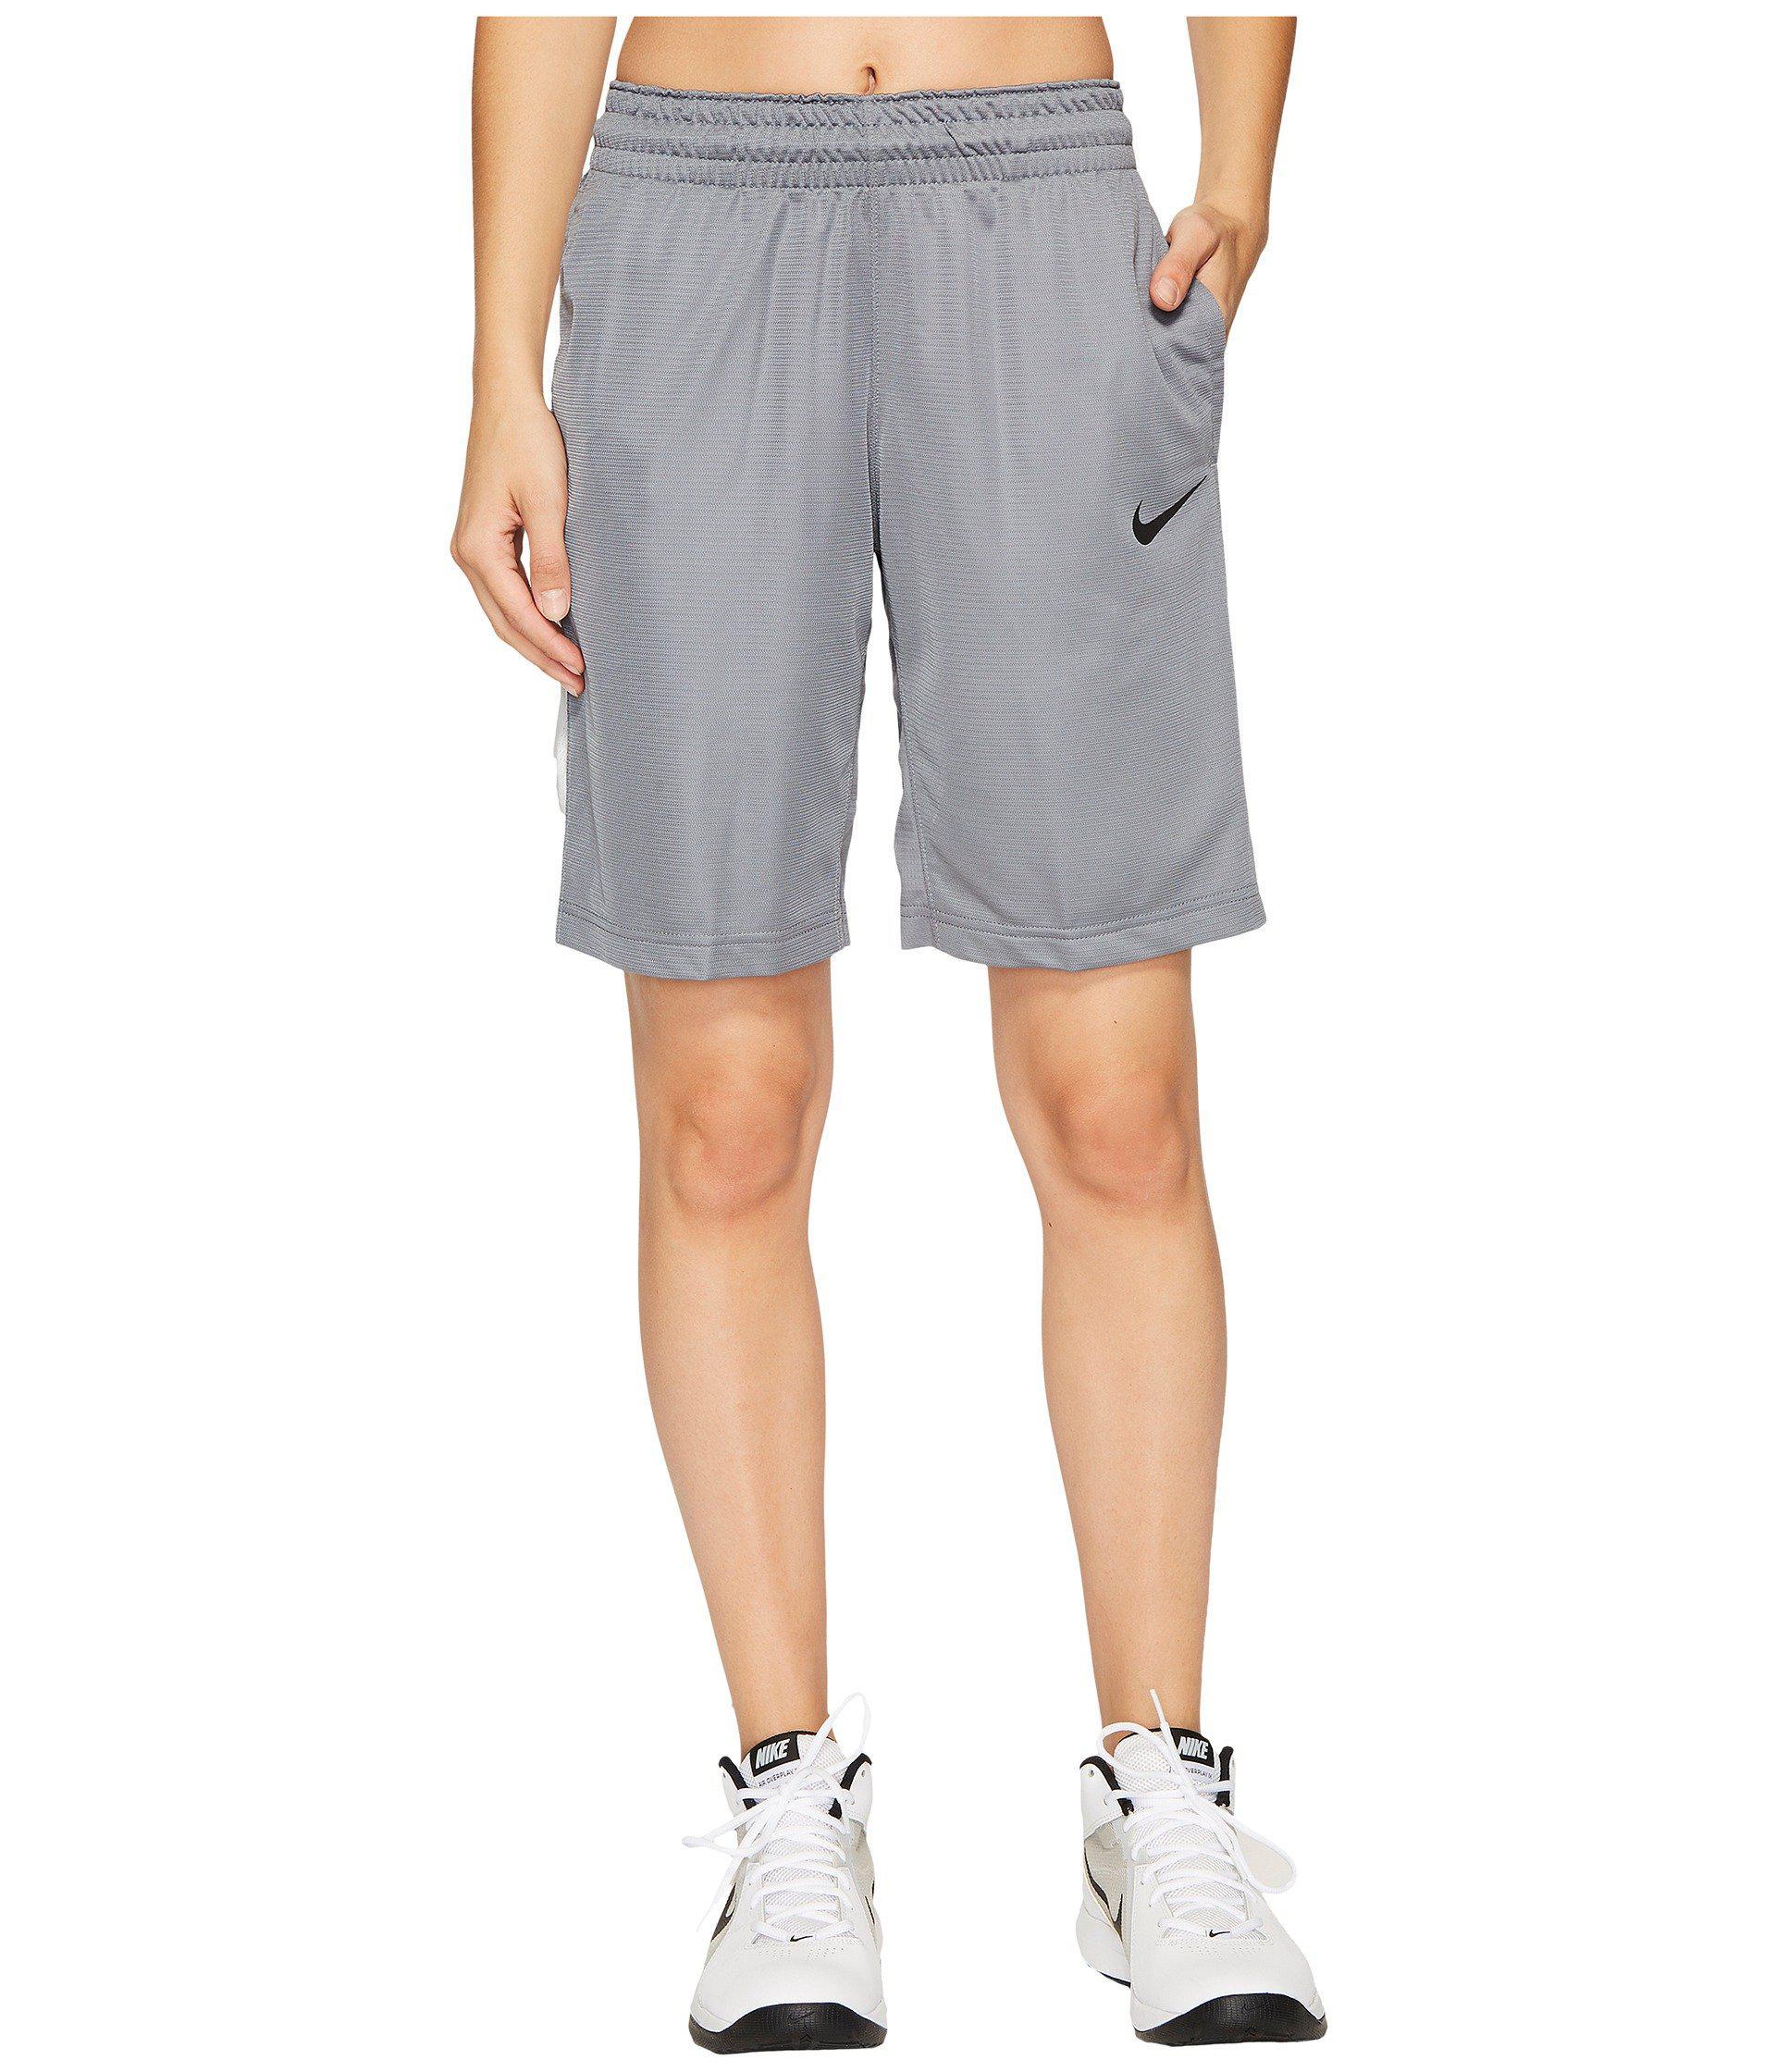 3a897385730e Lyst - Nike Dry Essential 10 Basketball Short (black black white ...